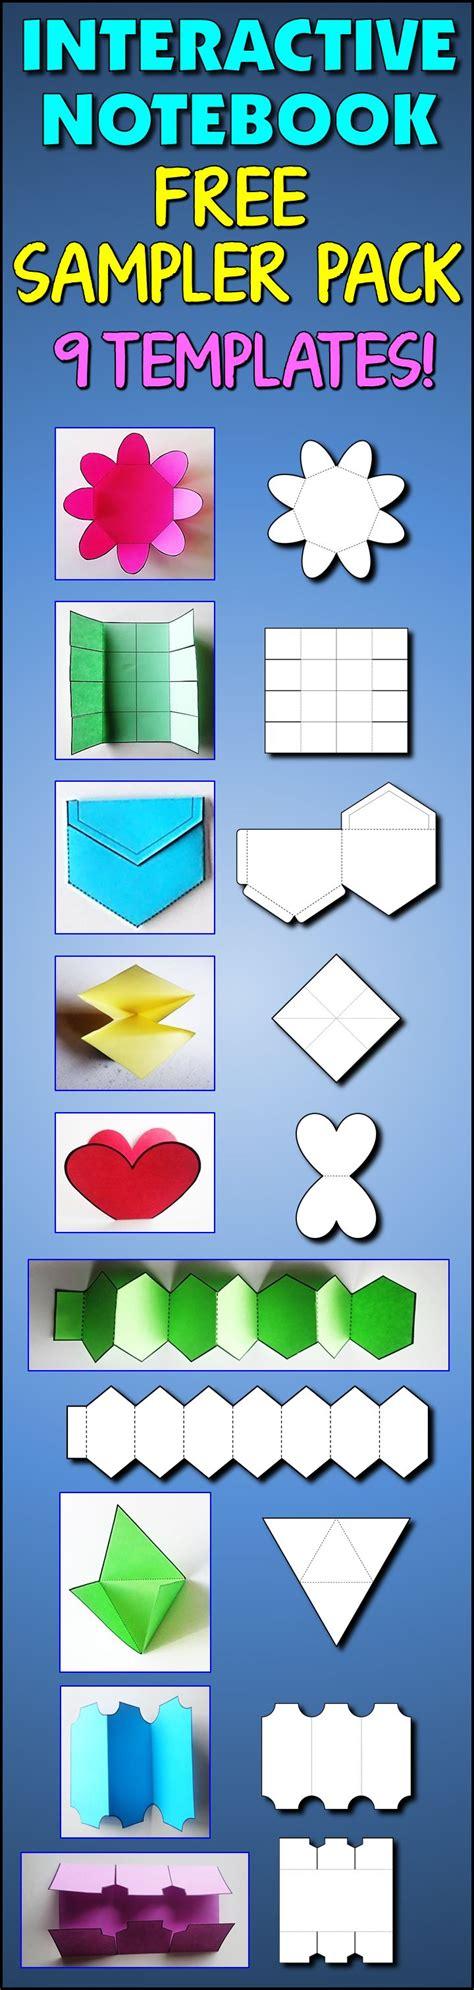 interactive notebook templates 17 best images about interactive notebooks on math notebooks math and cartesian